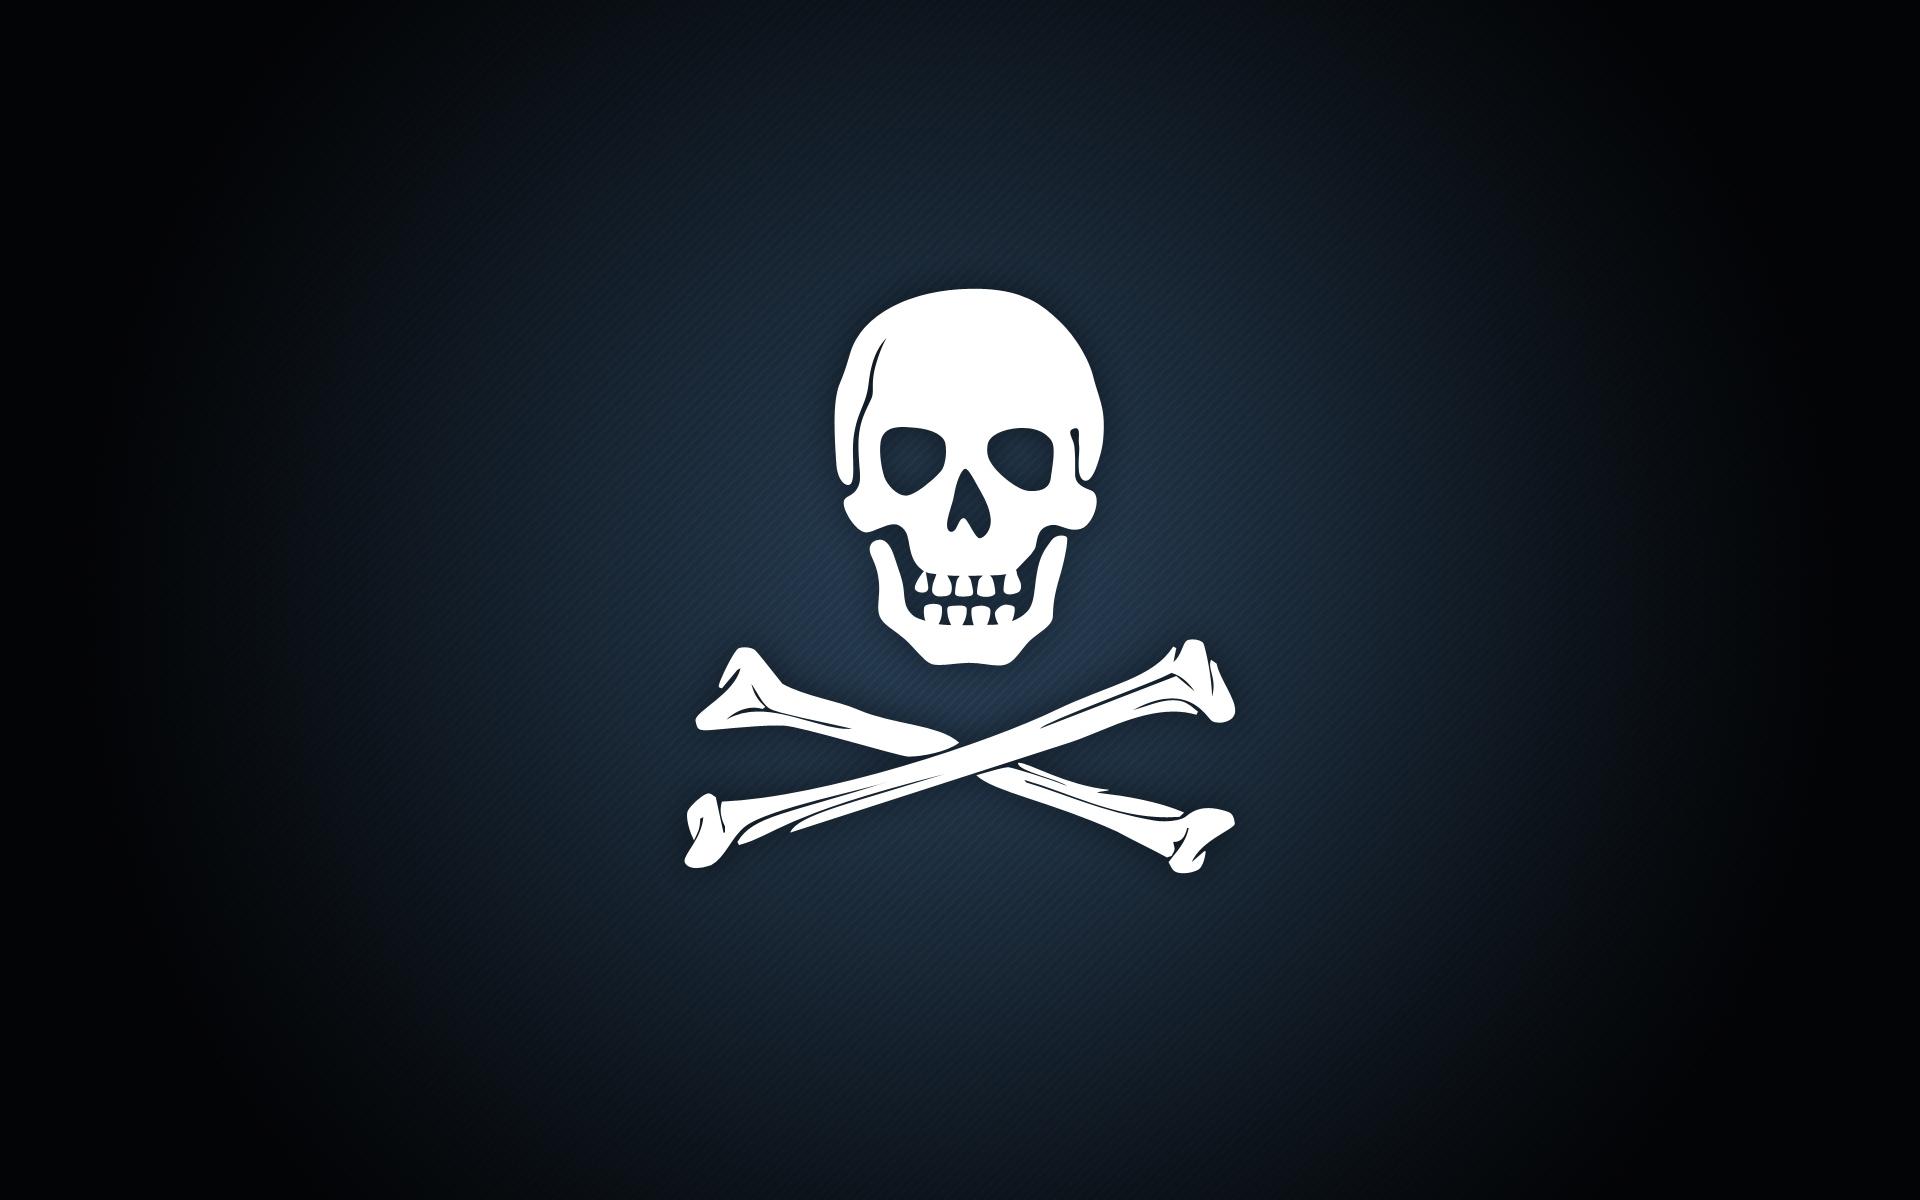 Flag Skull Wallpaper in high resolution for Get Pirate Flag 1920x1200